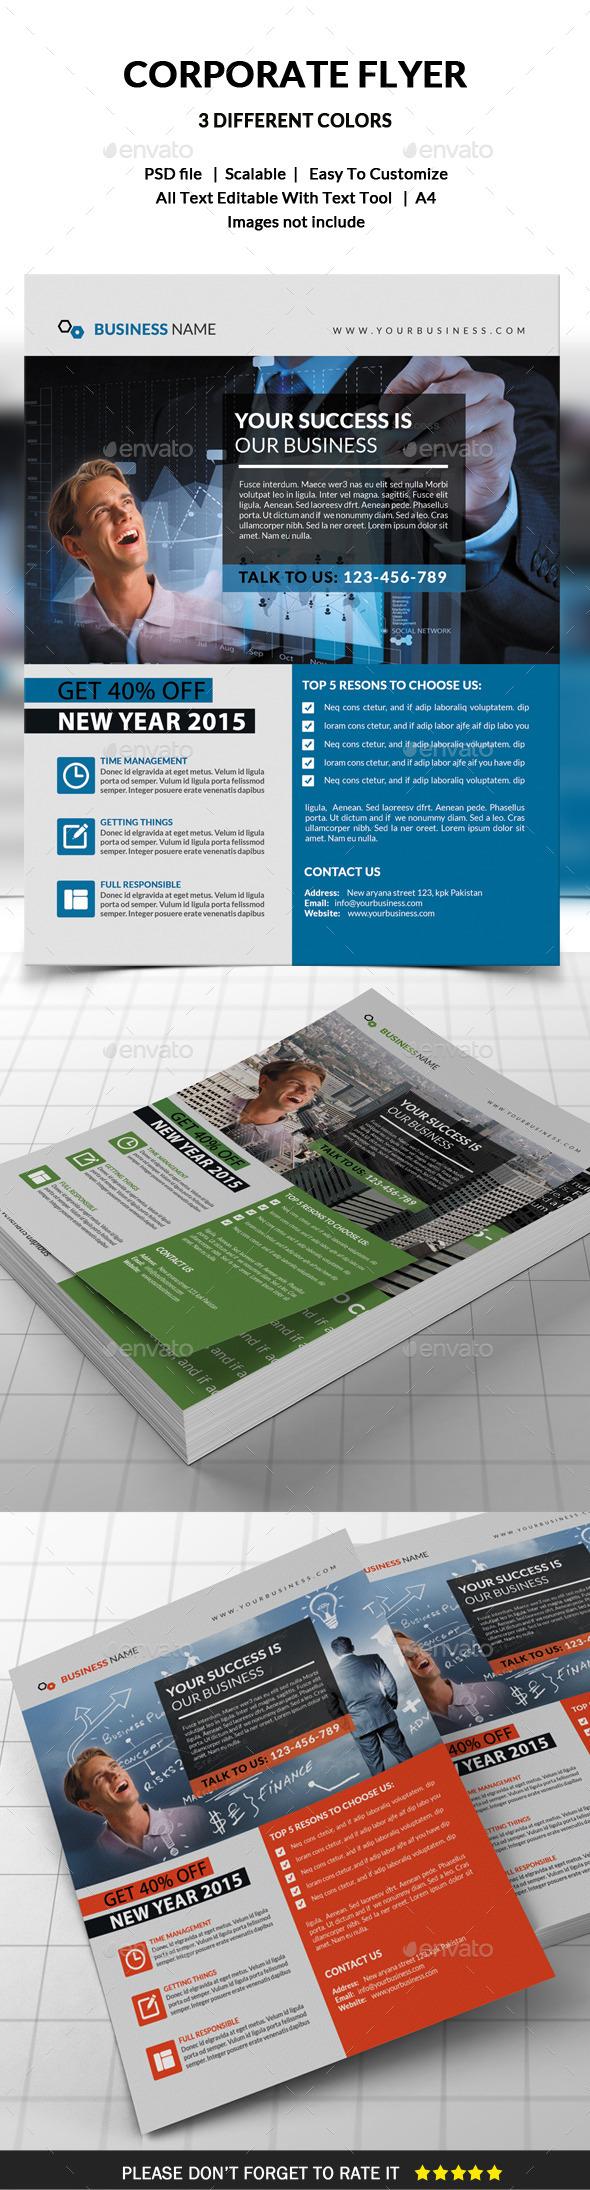 GraphicRiver Corporate Flyer 9658337